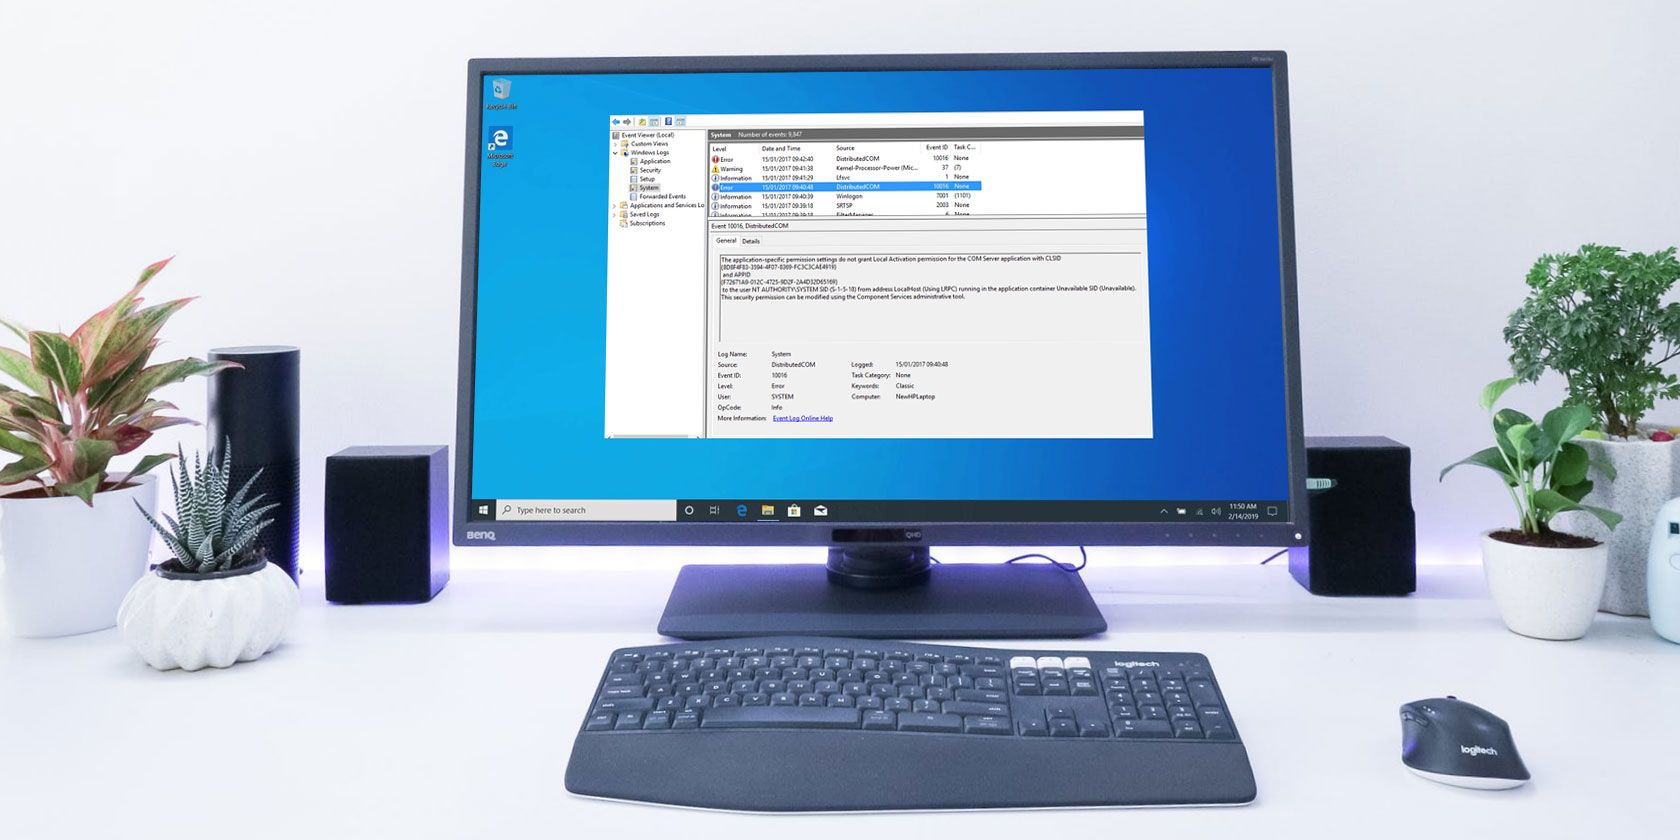 How to Fix the DistributedCOM Error 10016 in Windows 10